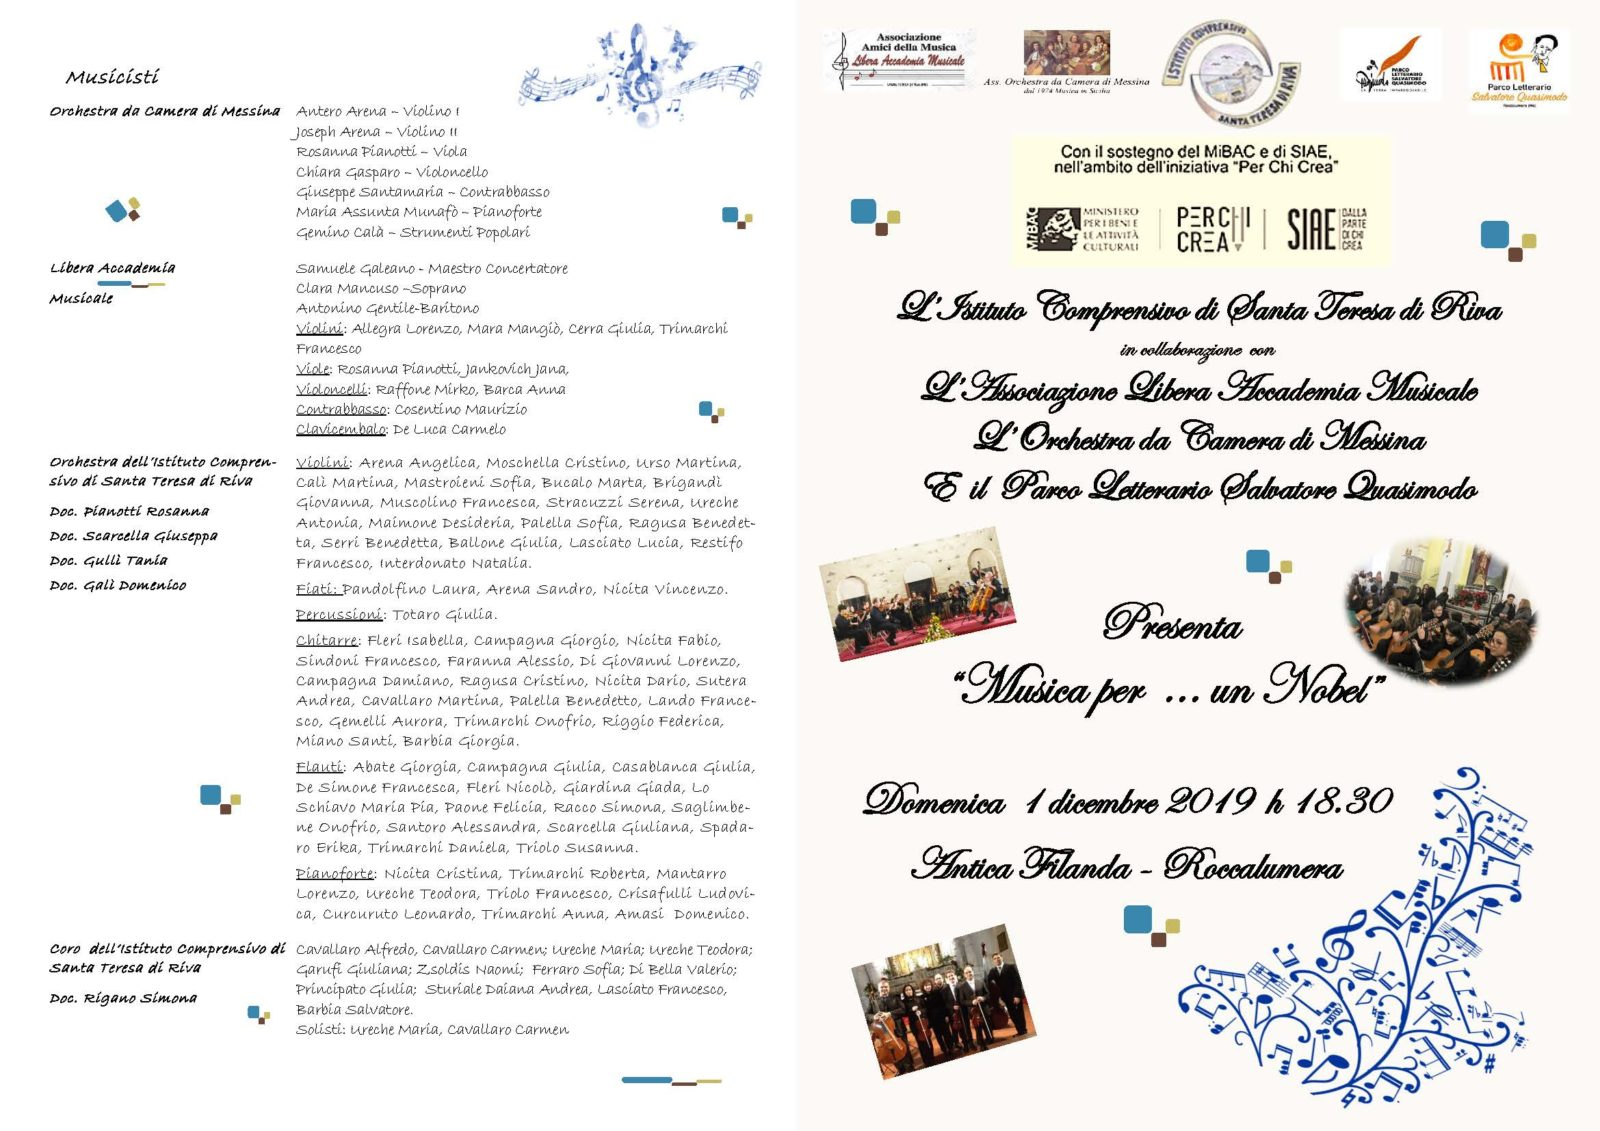 Programma di sala 1 dicembre Antica Filanda